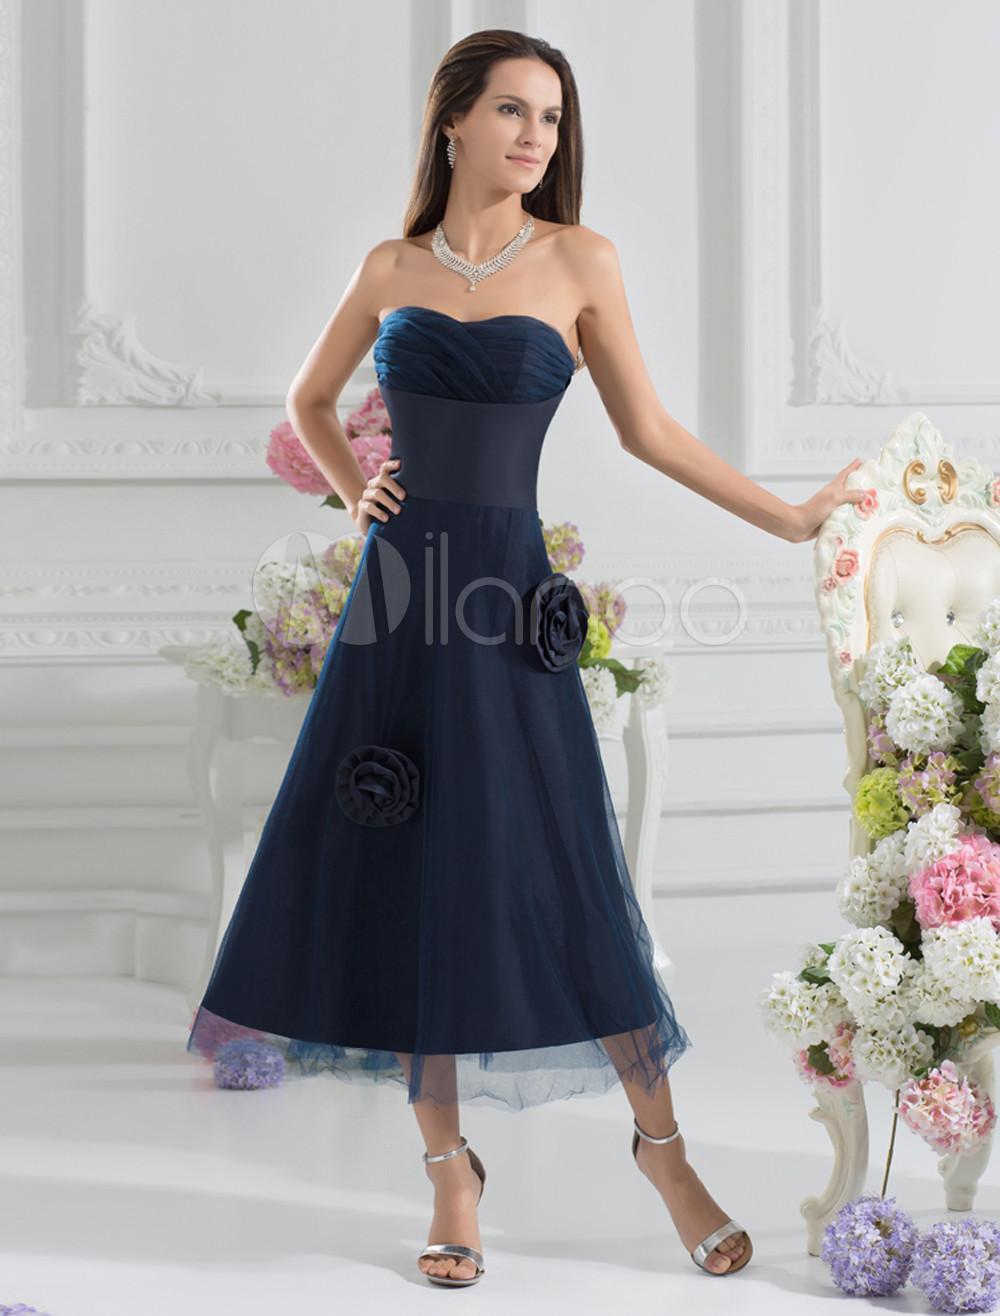 Grace A-line Dark Navy Tulle Flower Sweetheart Neck Bridesmaid Dress For Wedding